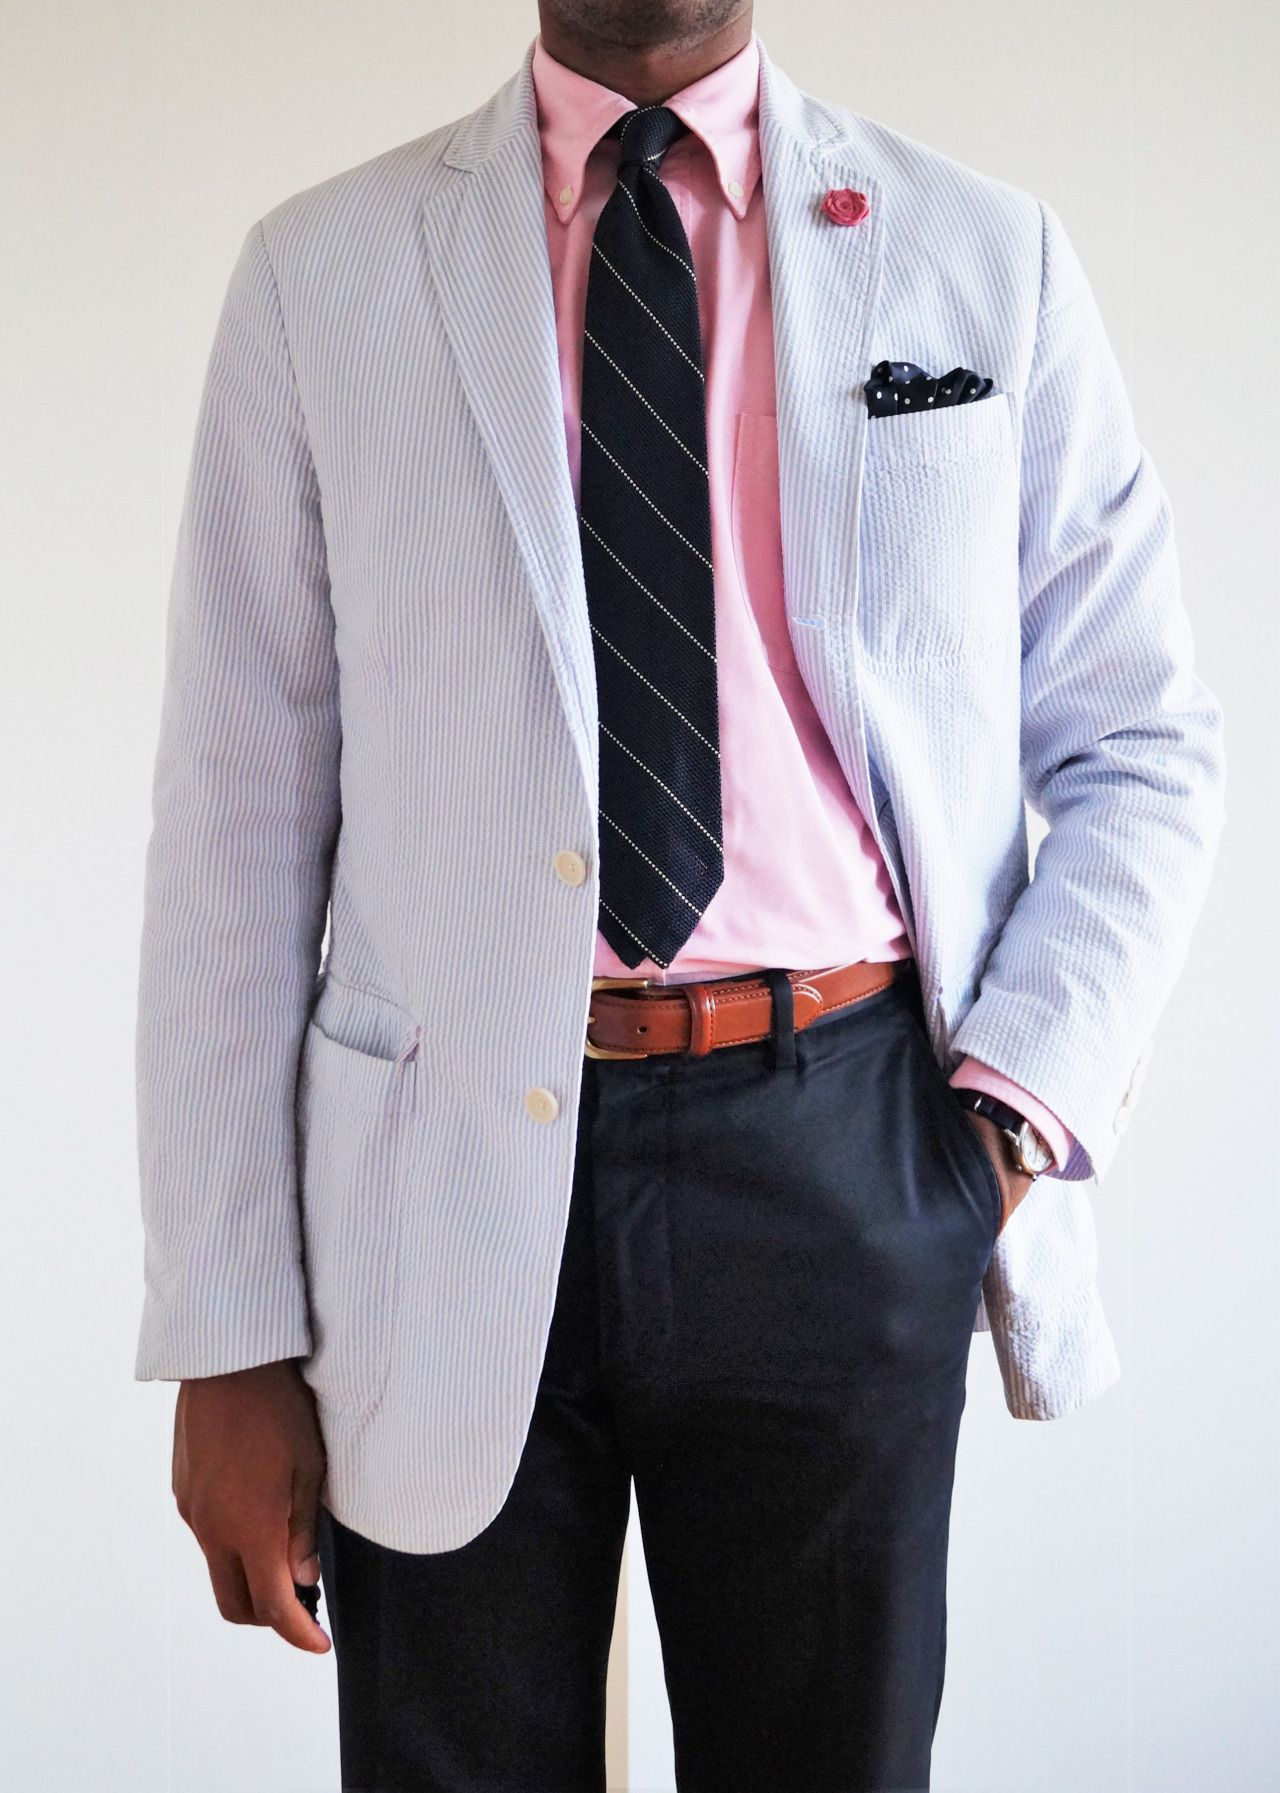 Seersucker Jacket Pink Ocbd Navy Tie With White Stripes Navy